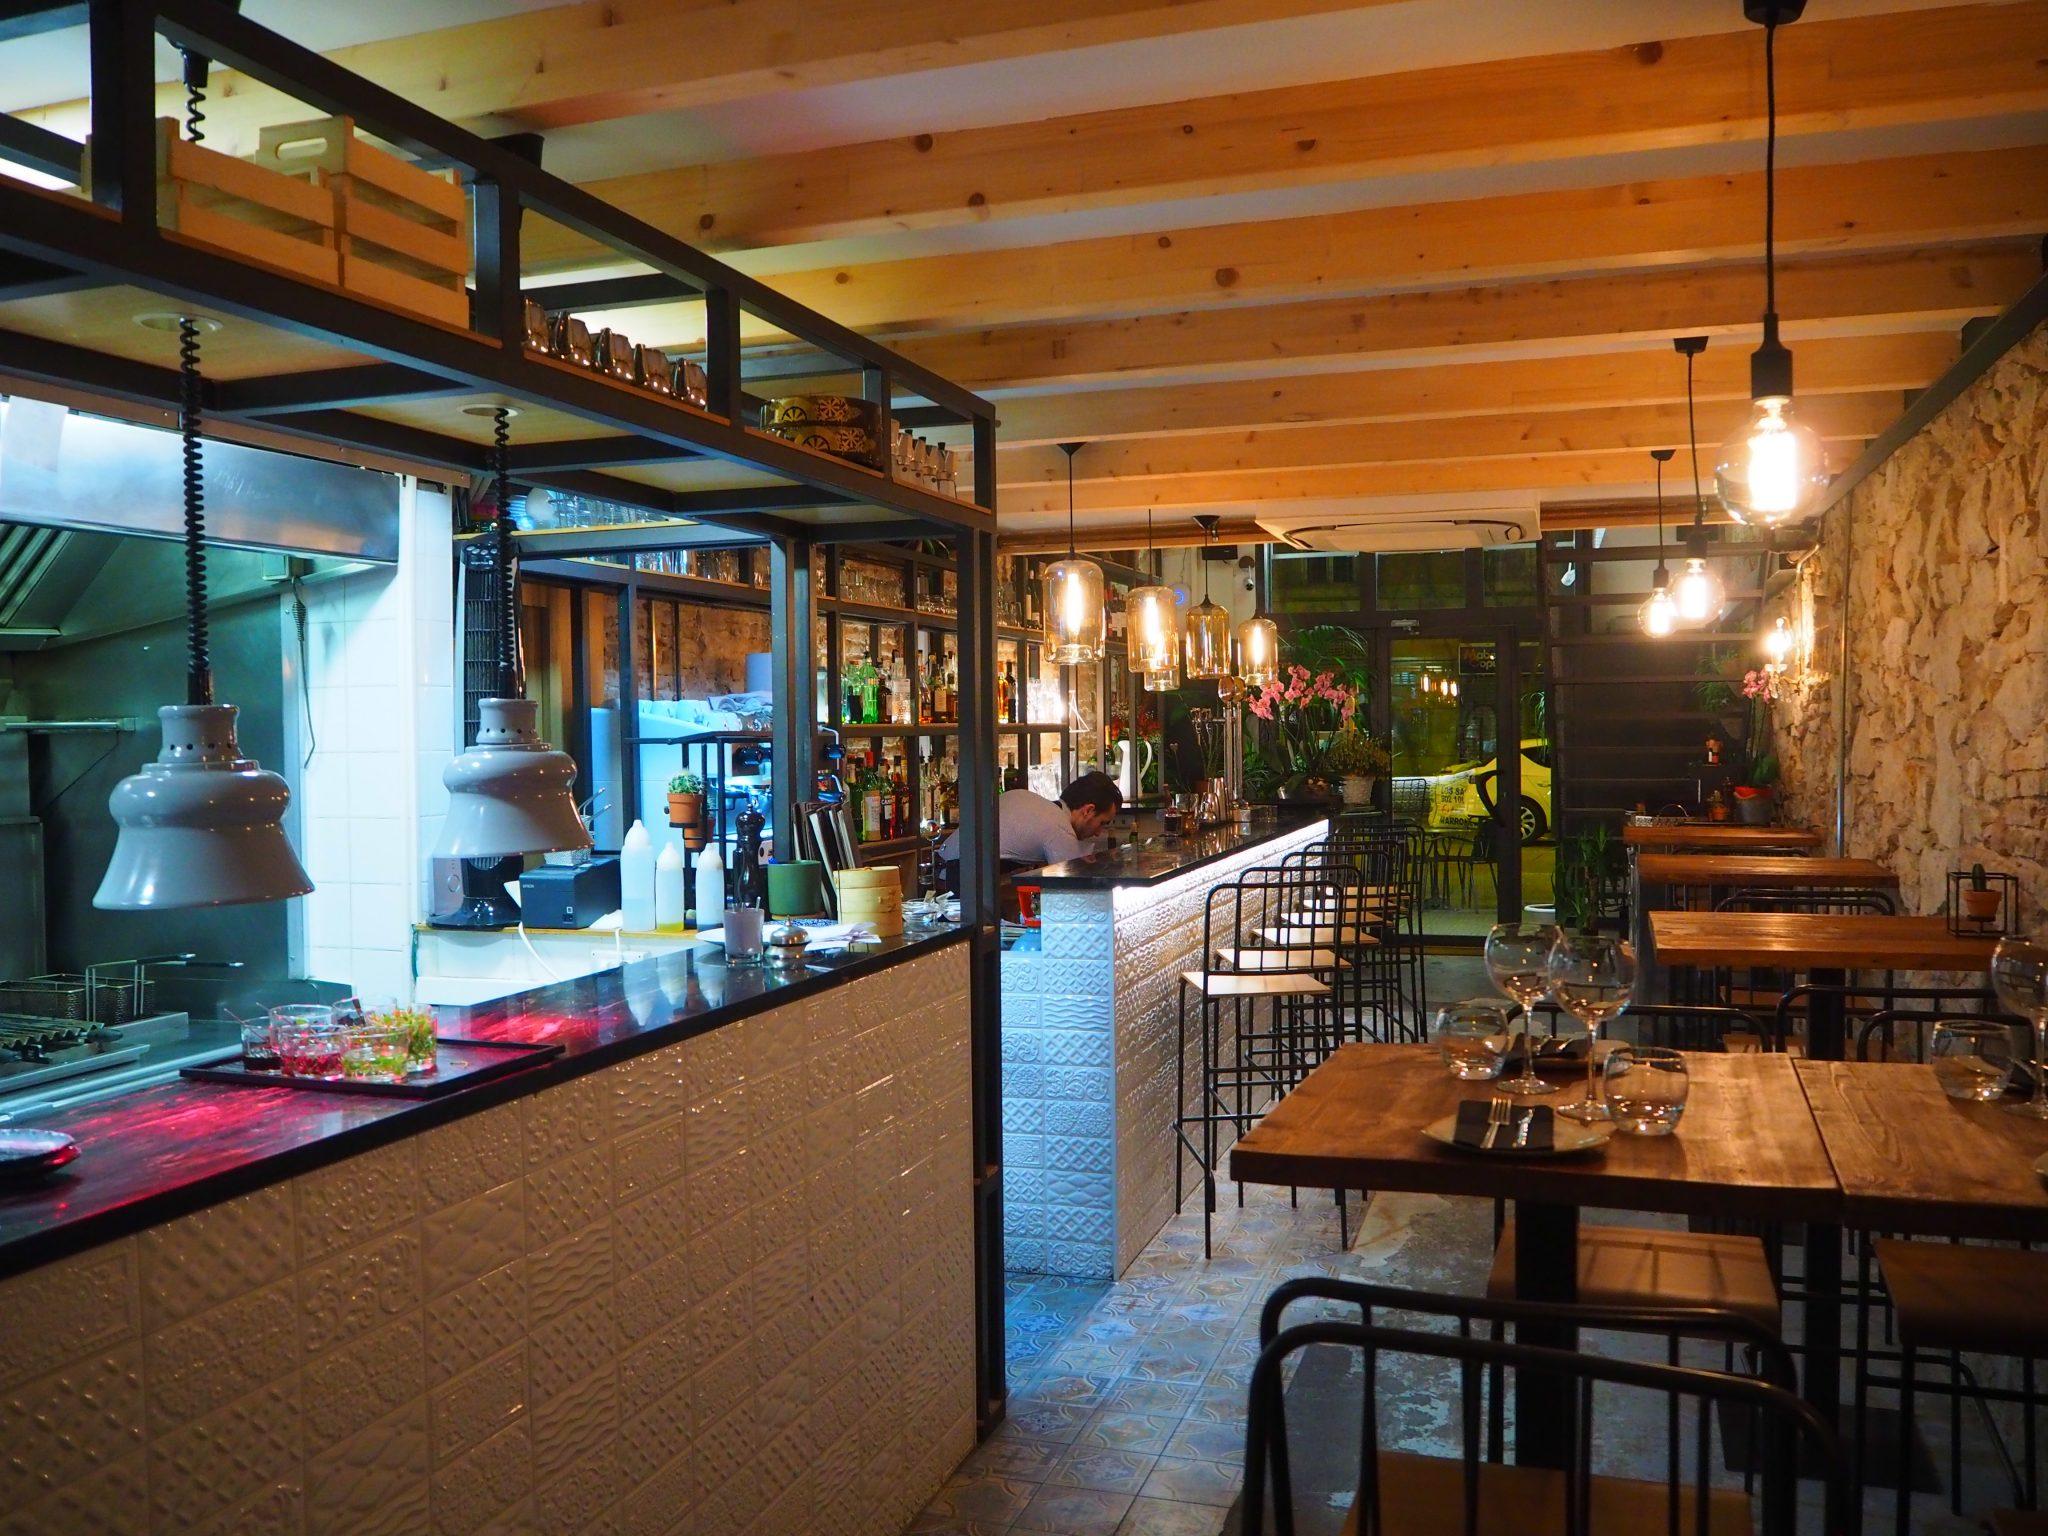 Agust Gastrobar Barcelona - Ground floor / Rez-de-chaussée